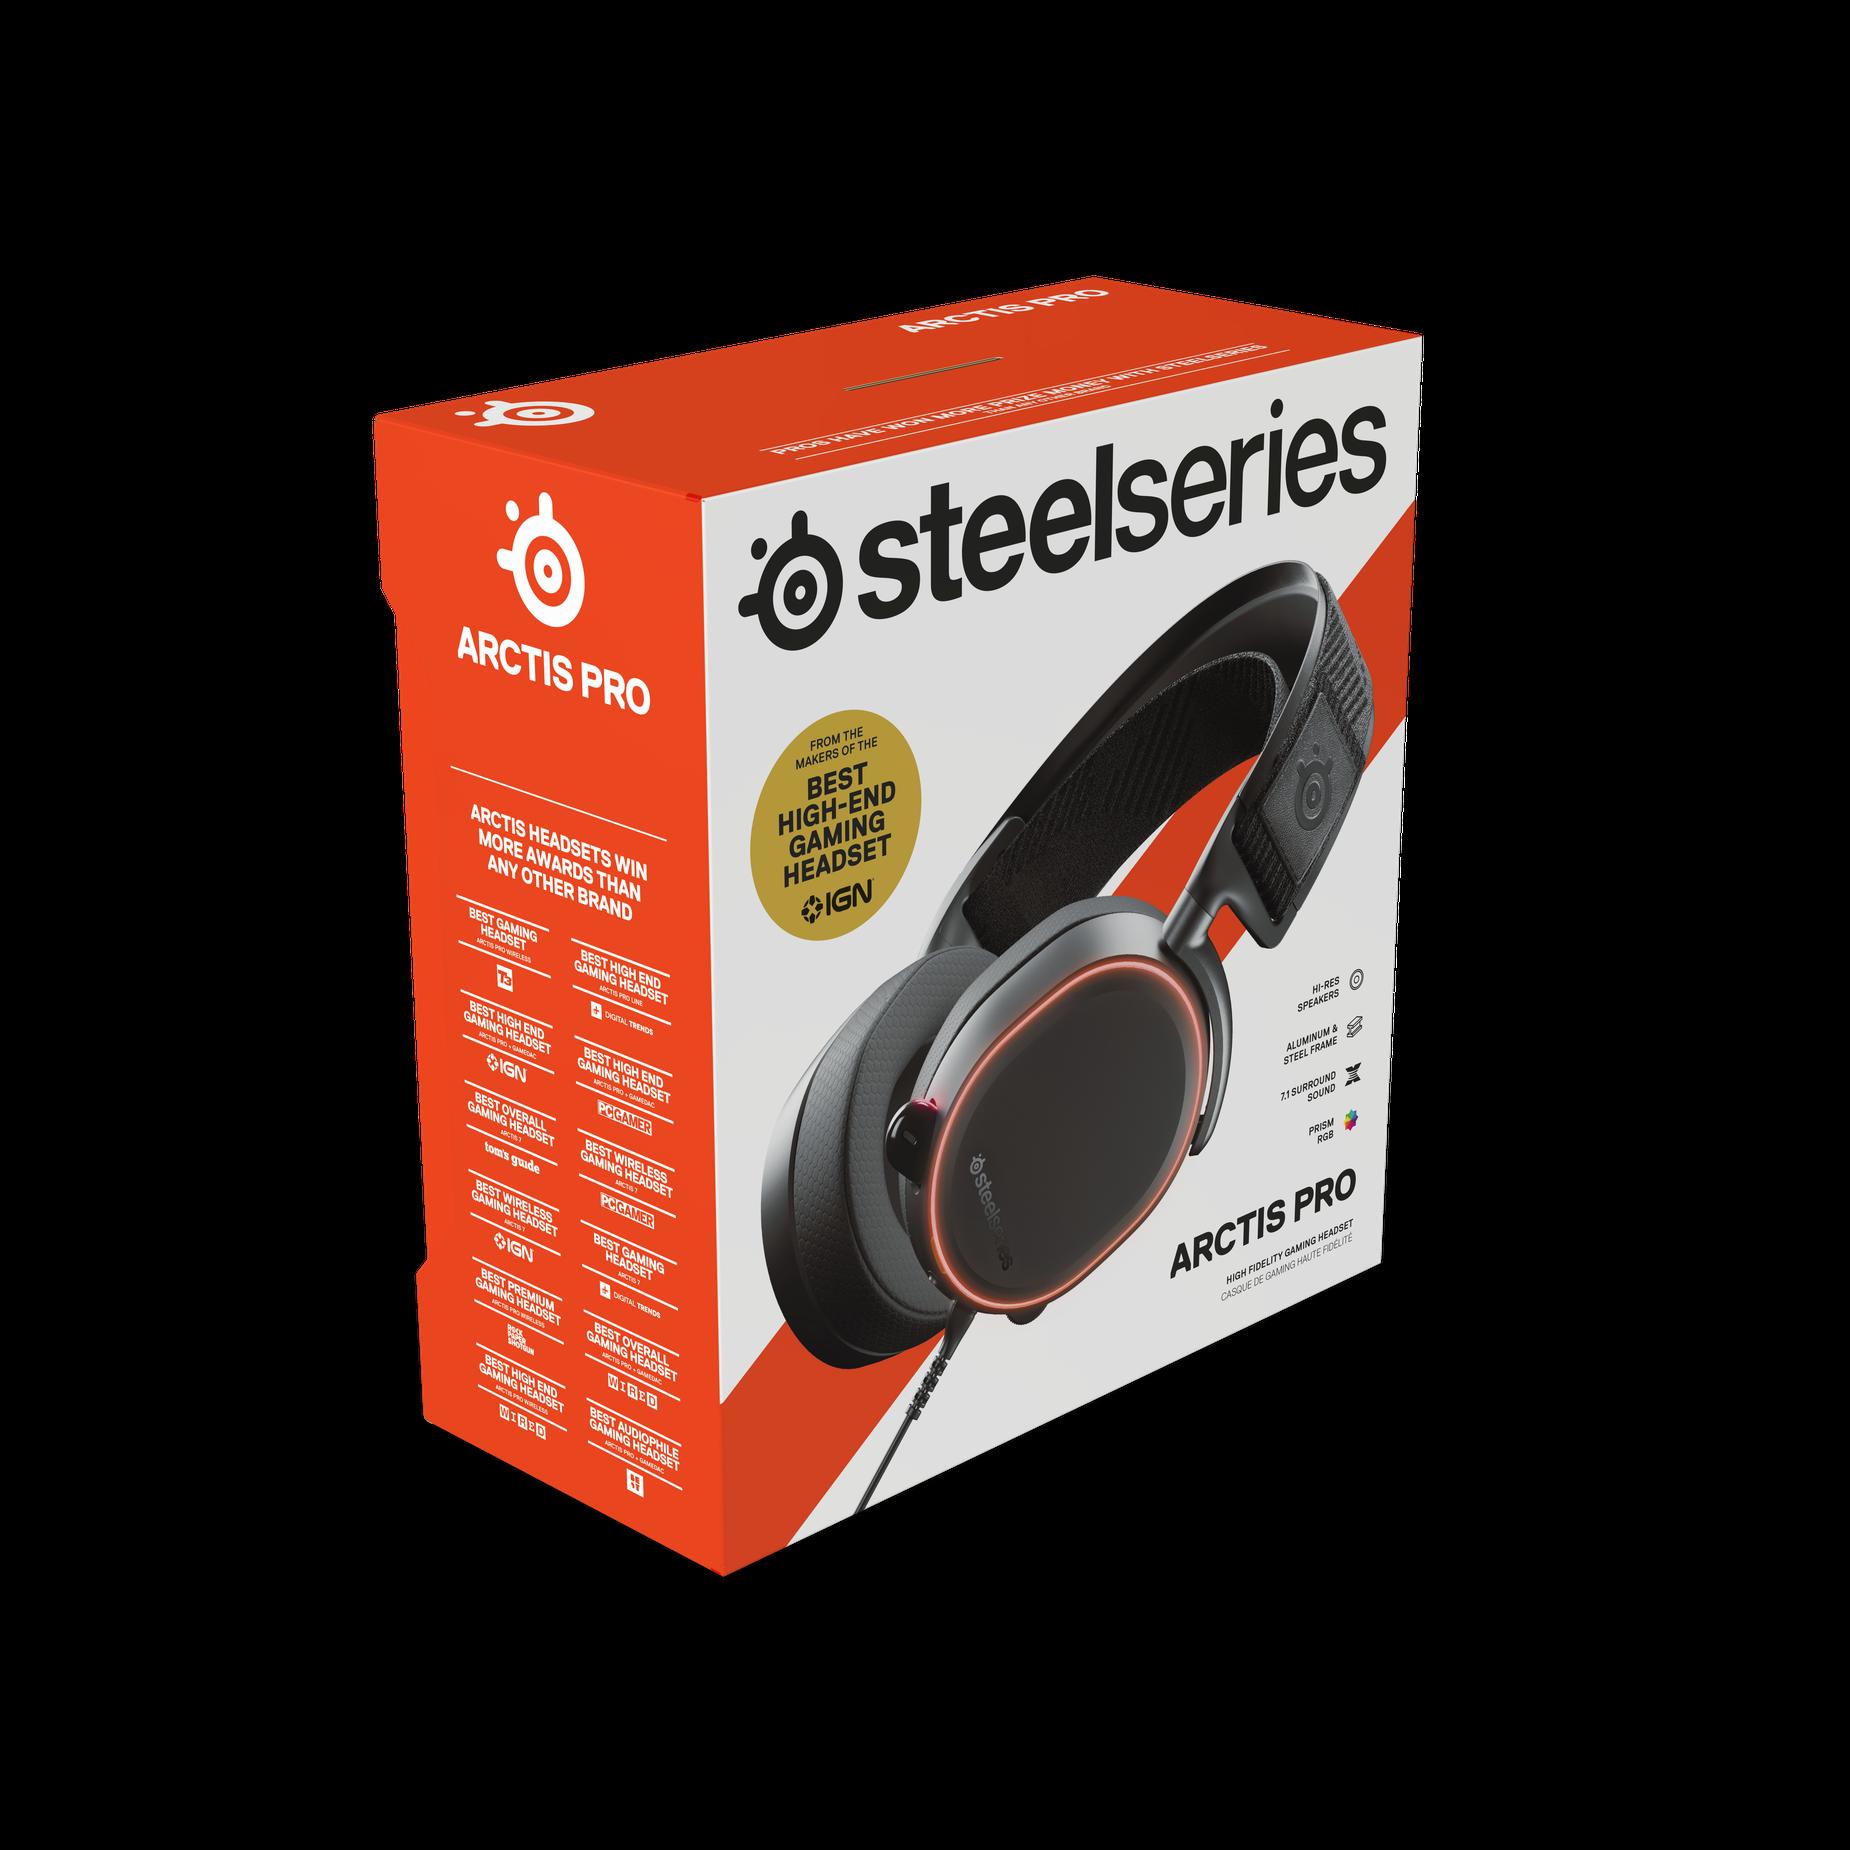 Arctis Pro headset exterior packaging.